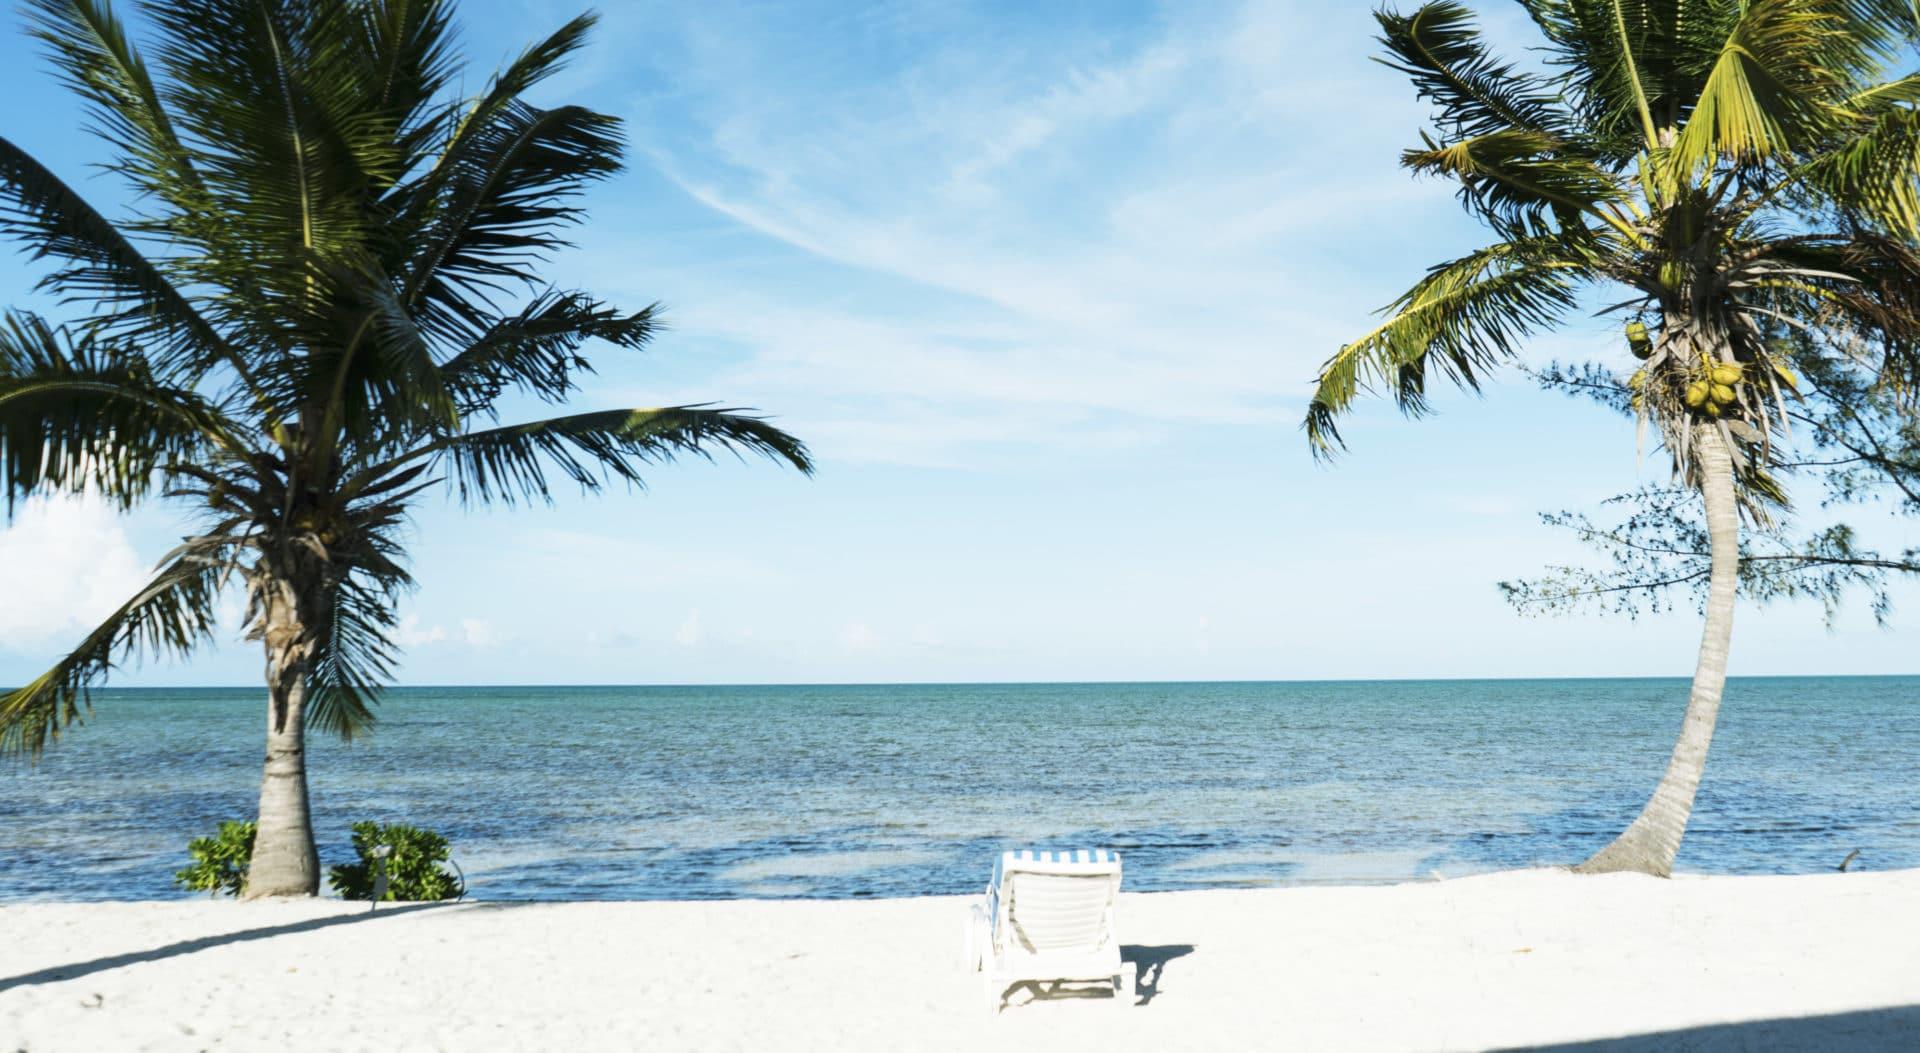 Plage aux Bahamas